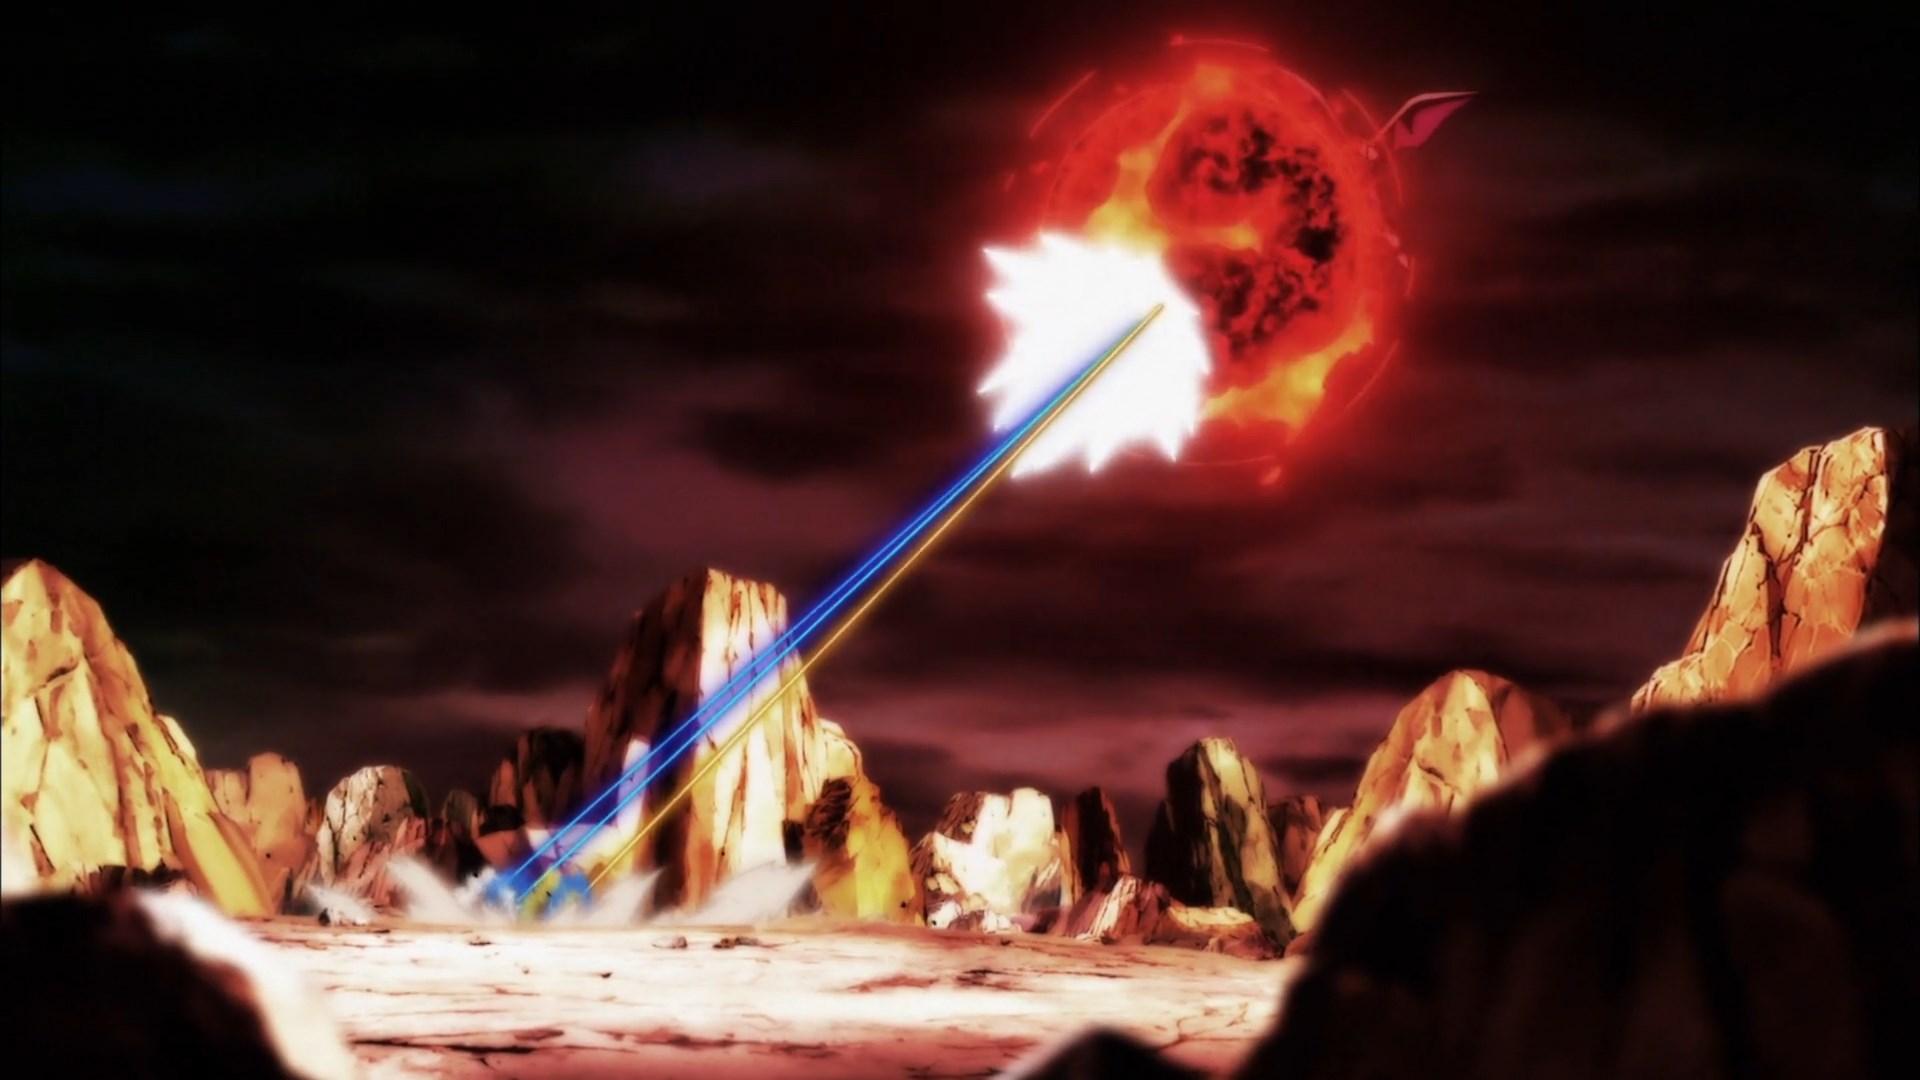 [HorribleSubs] Dragon Ball Super - 121 [1080p].mkv_snapshot_19.28